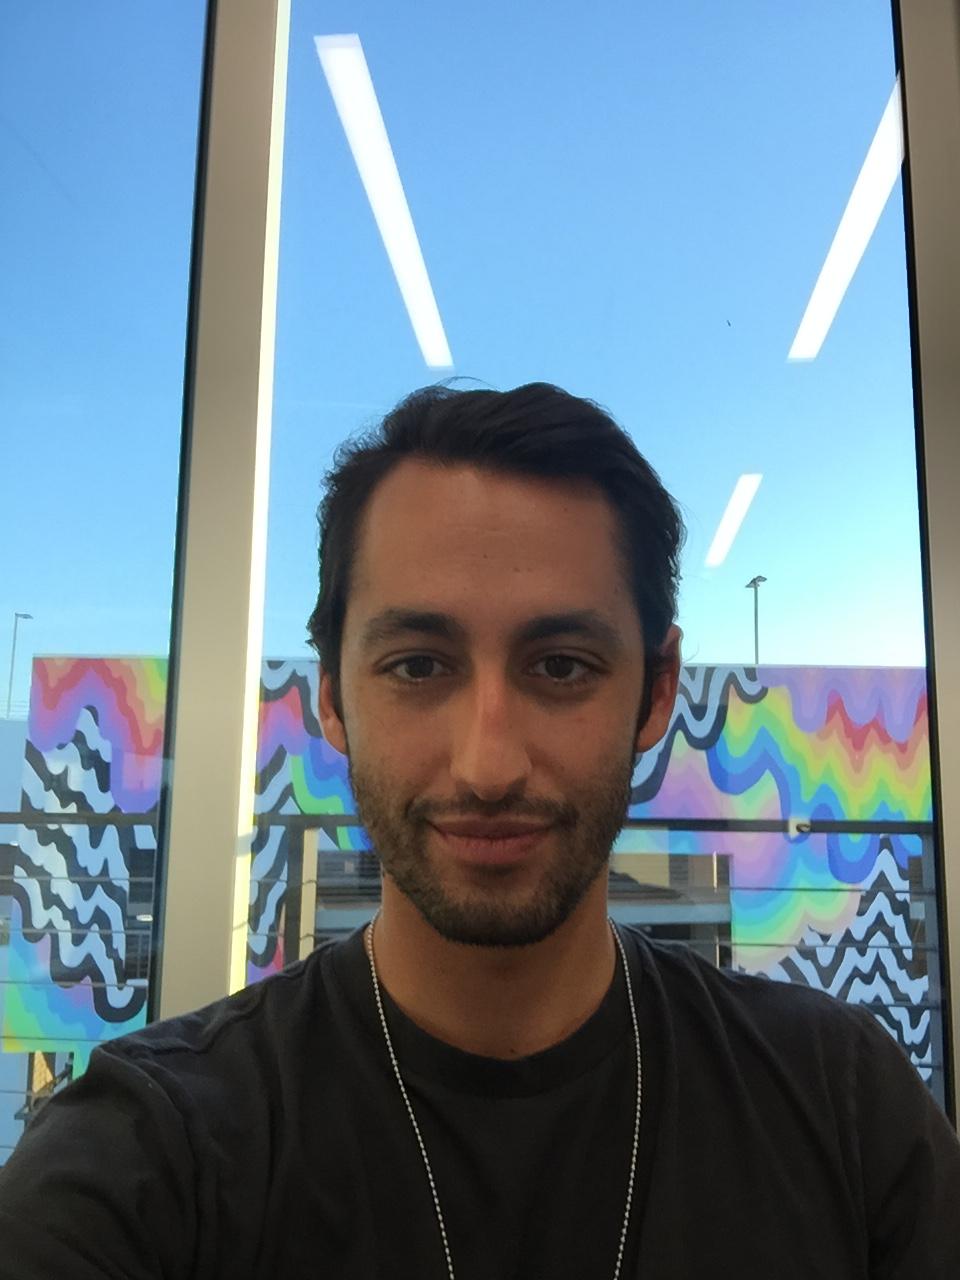 Jobs Report: Sweetgreen Co-Founder Jonathan Neman Lives the Sweet Life